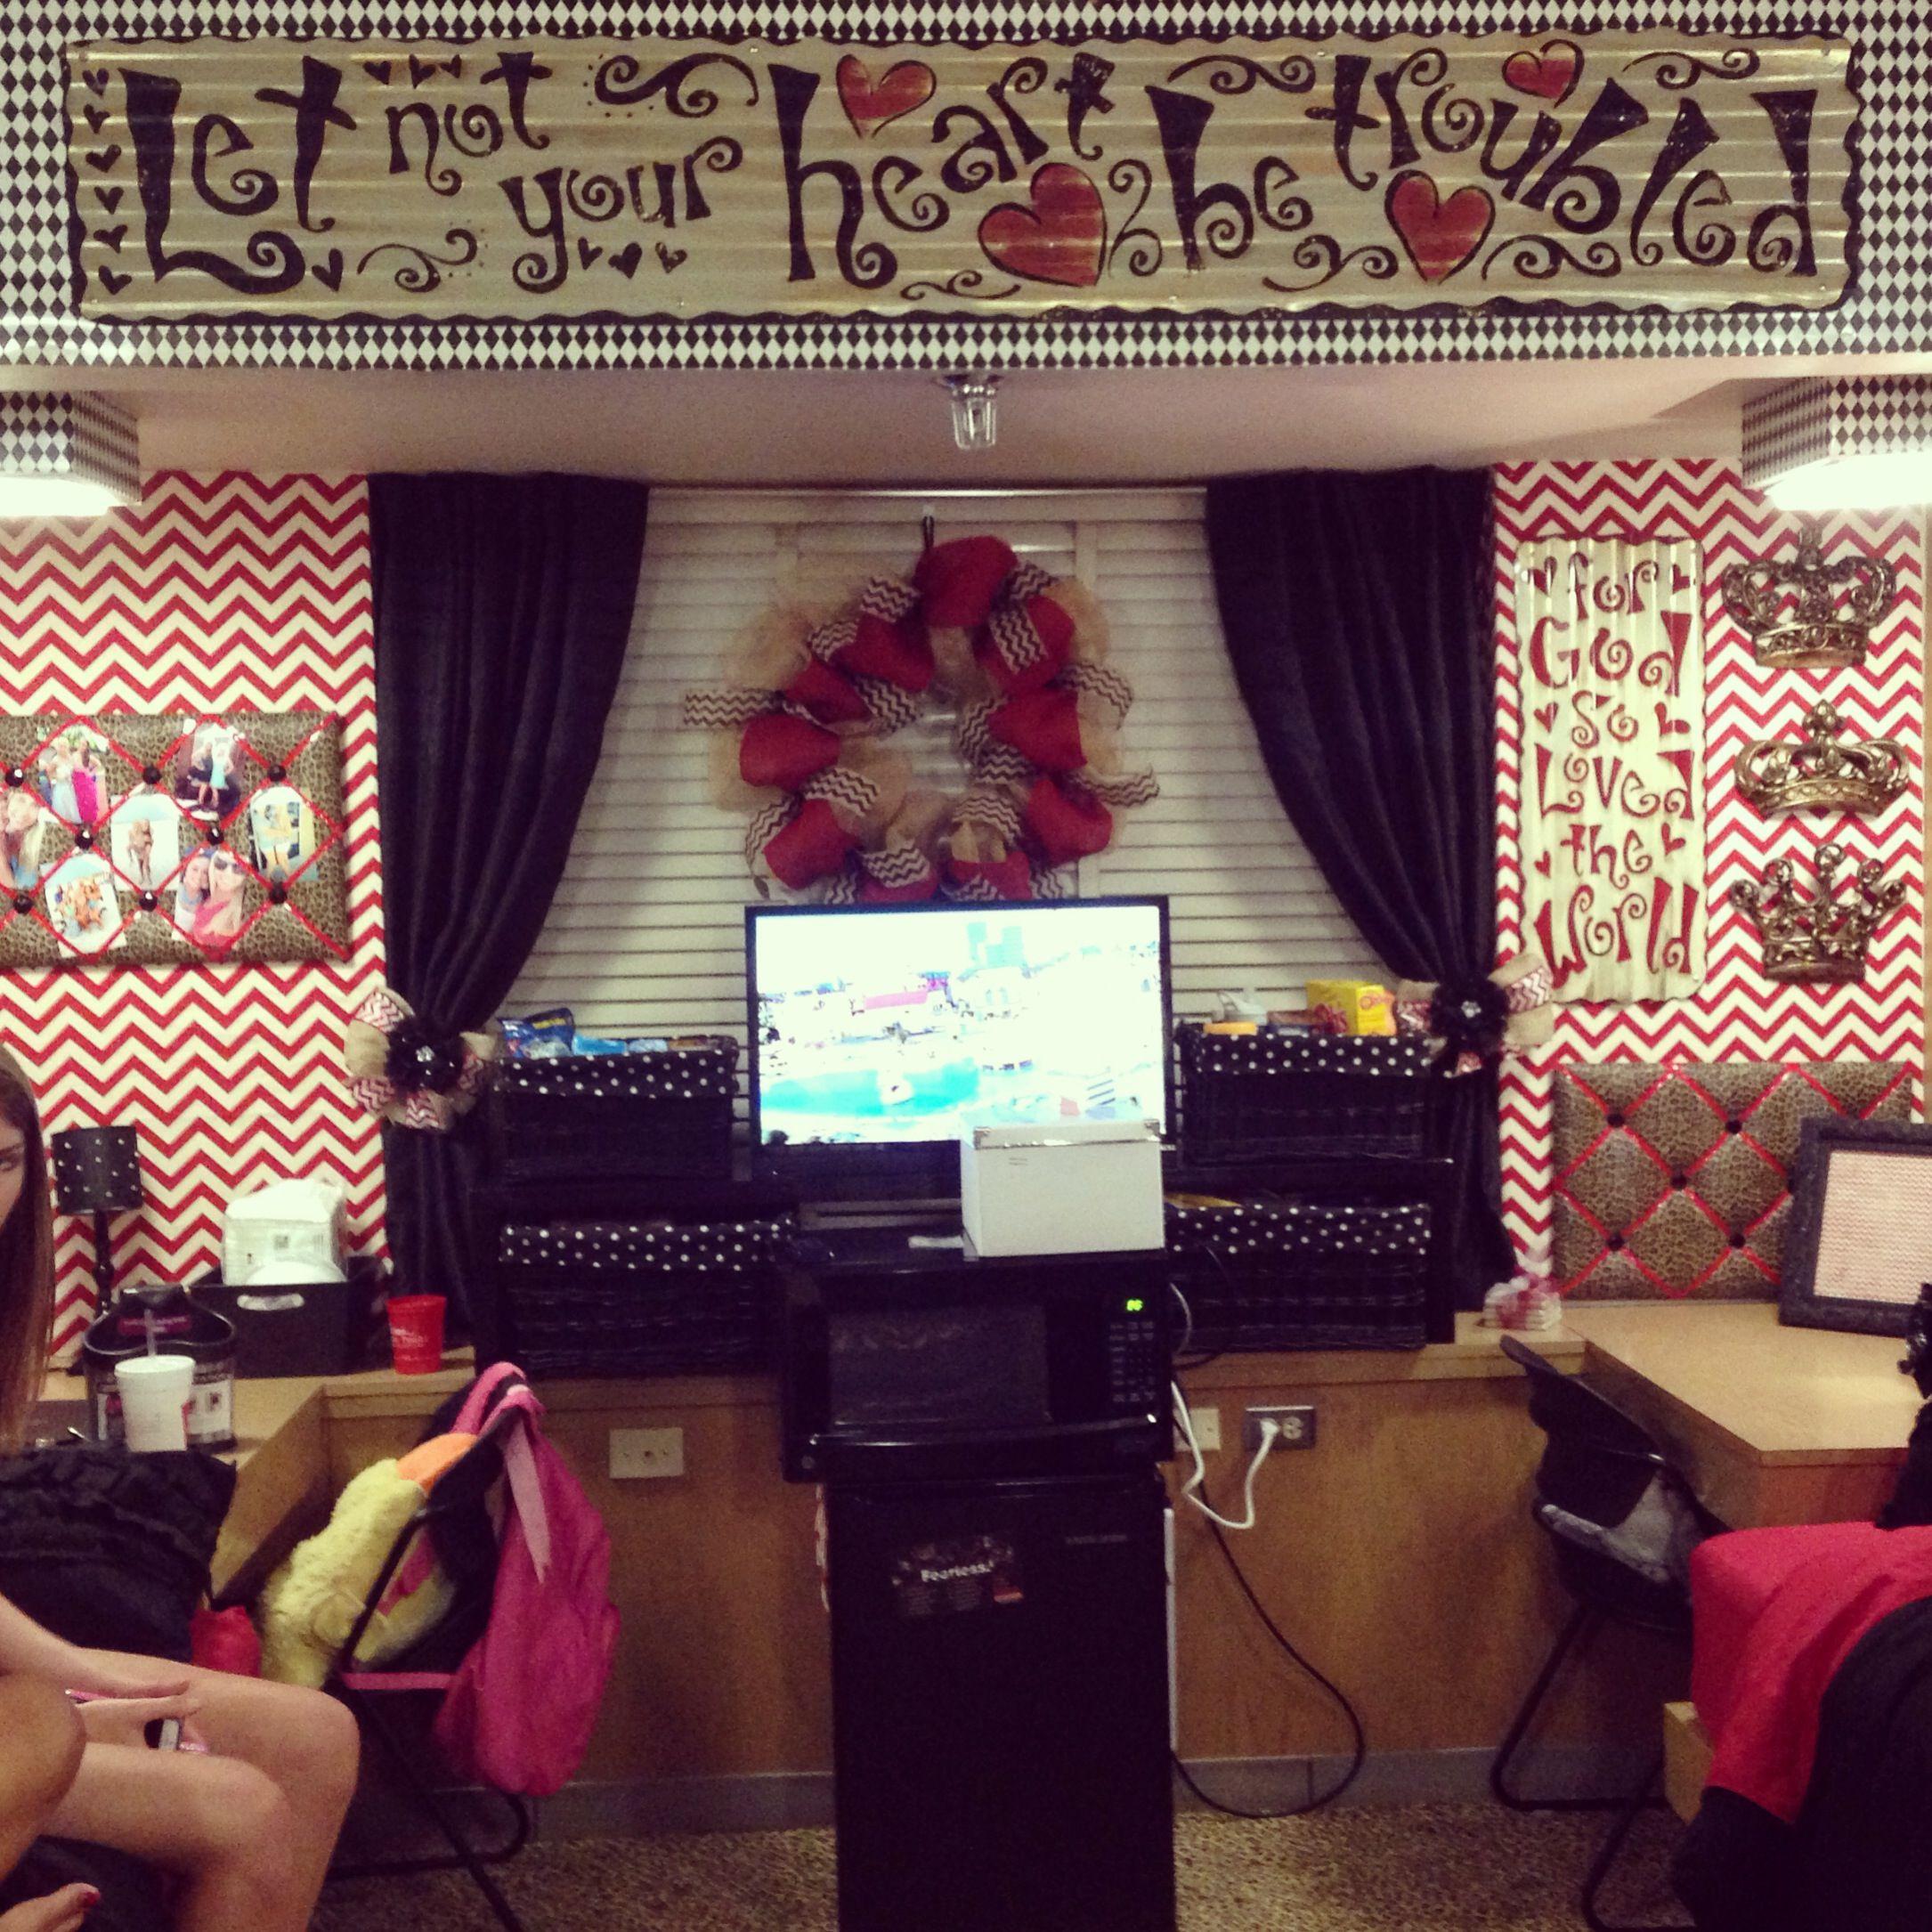 Texas Tech Stangel Hall Dorm Room